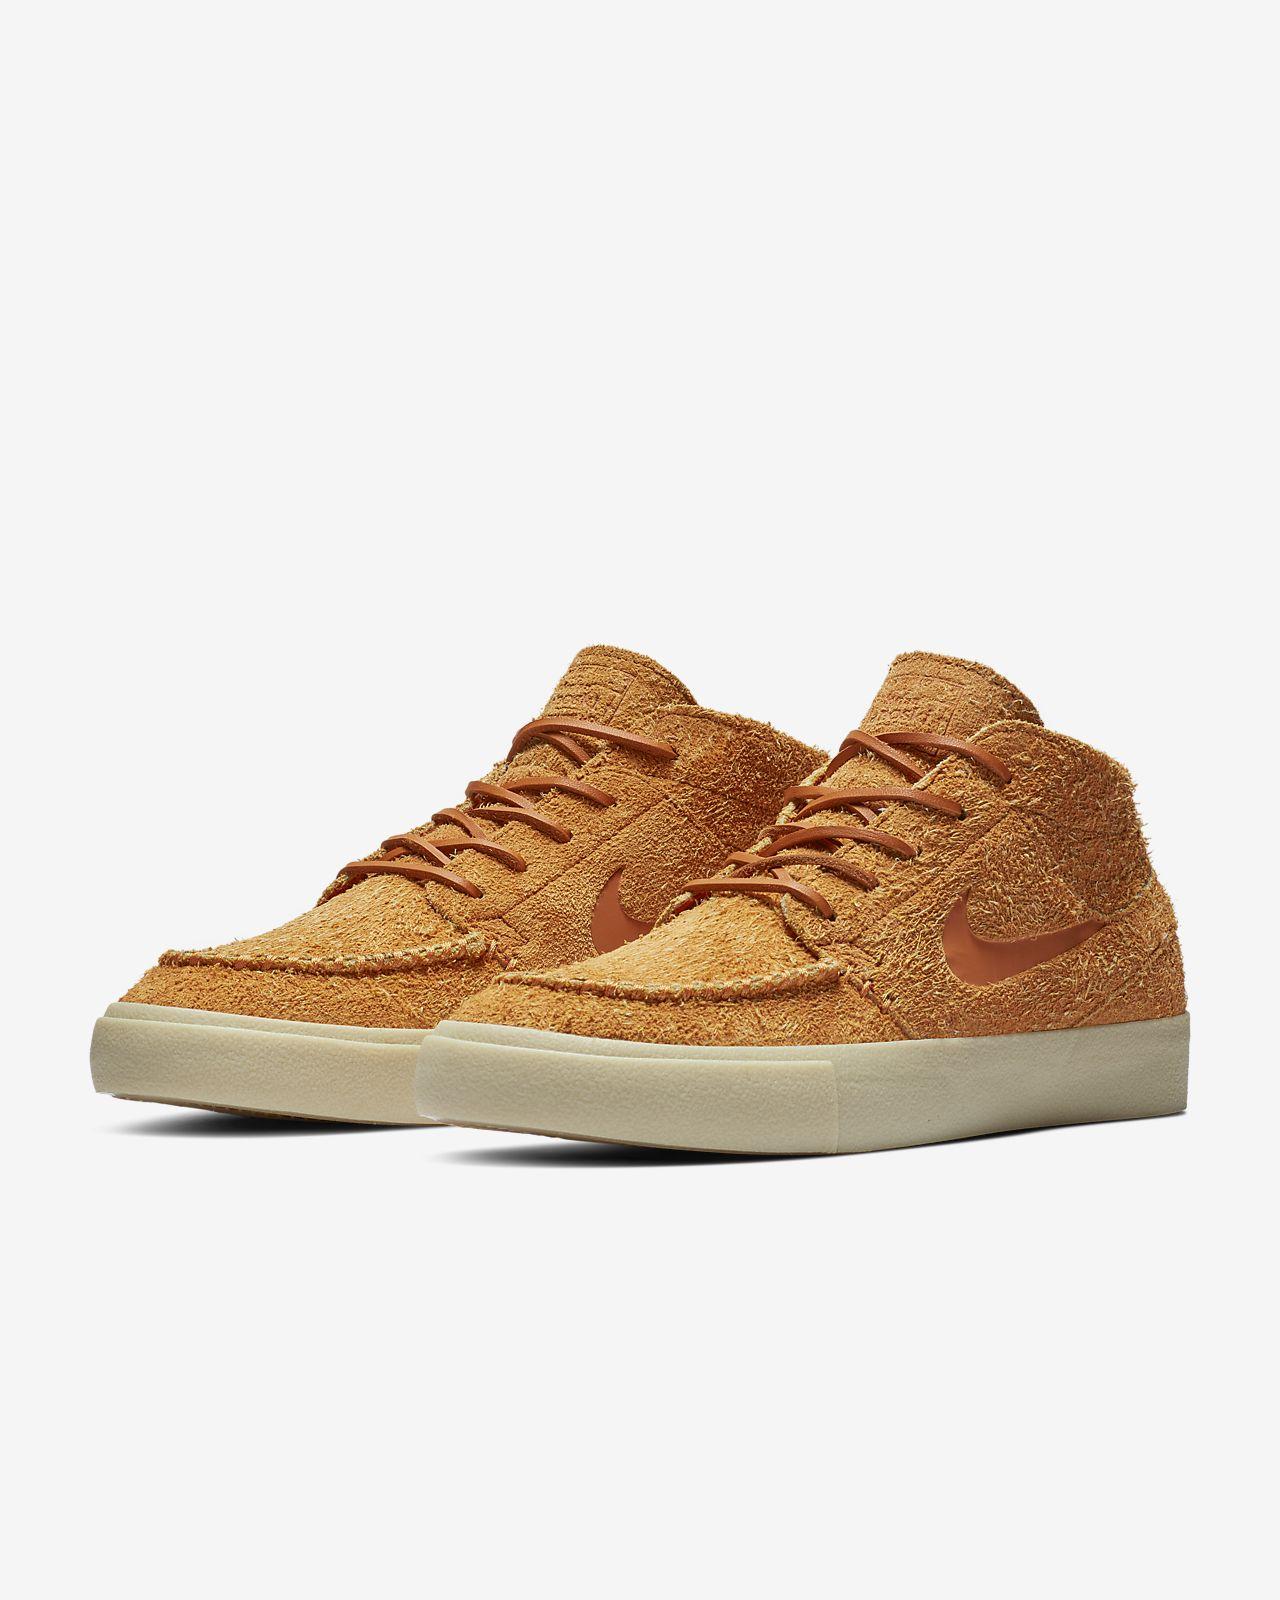 0a46a89d5732b ... Calzado de skateboarding para hombre Nike SB Zoom Janoski Mid Crafted